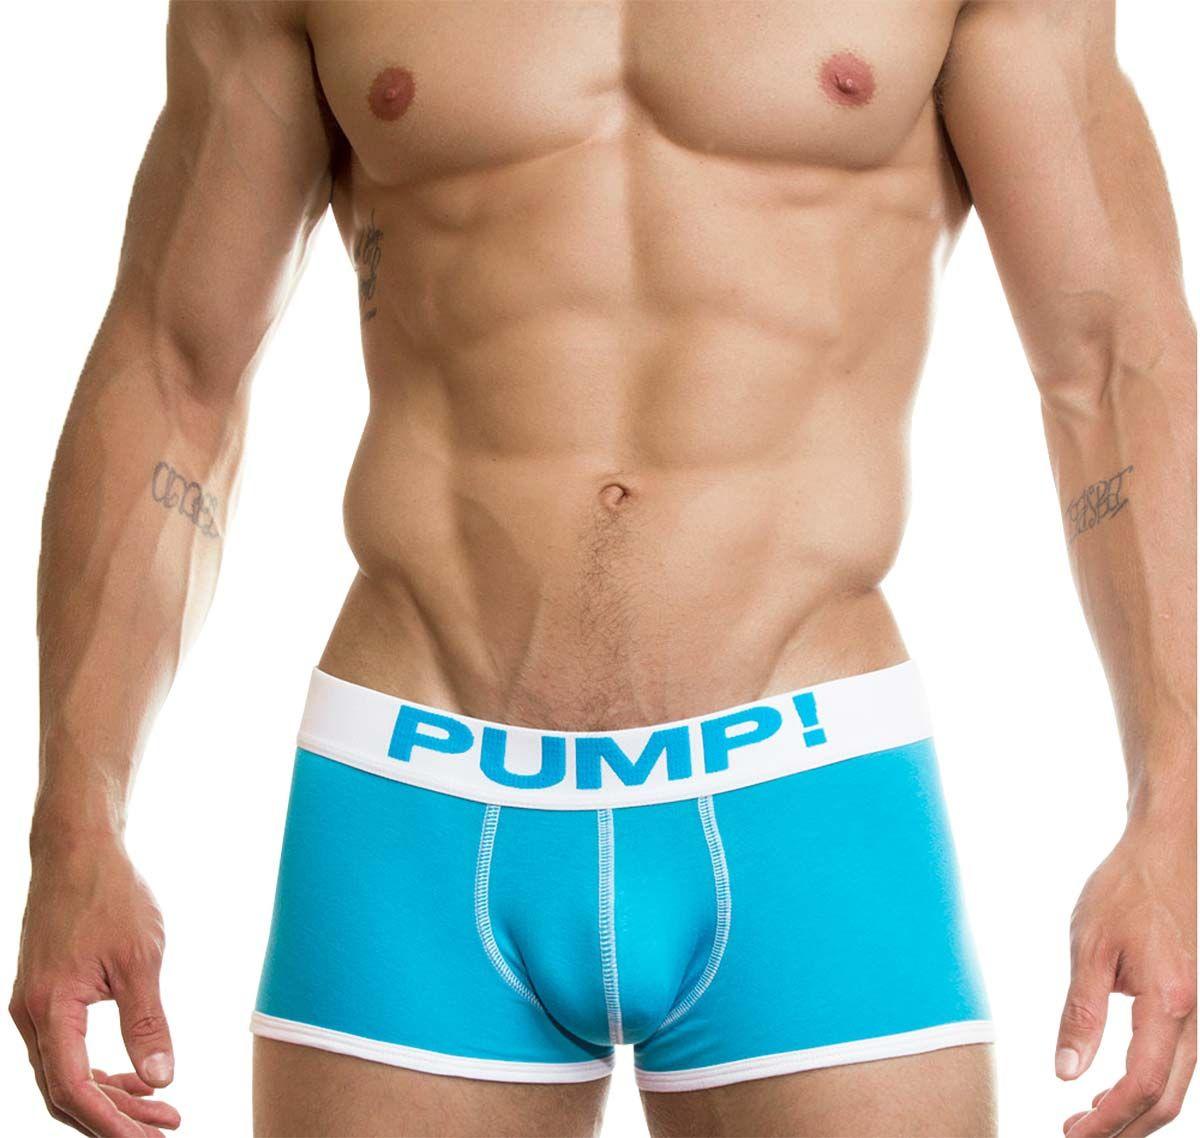 Pump! Boxershorts NEON FUEL 11002-01, hellblau